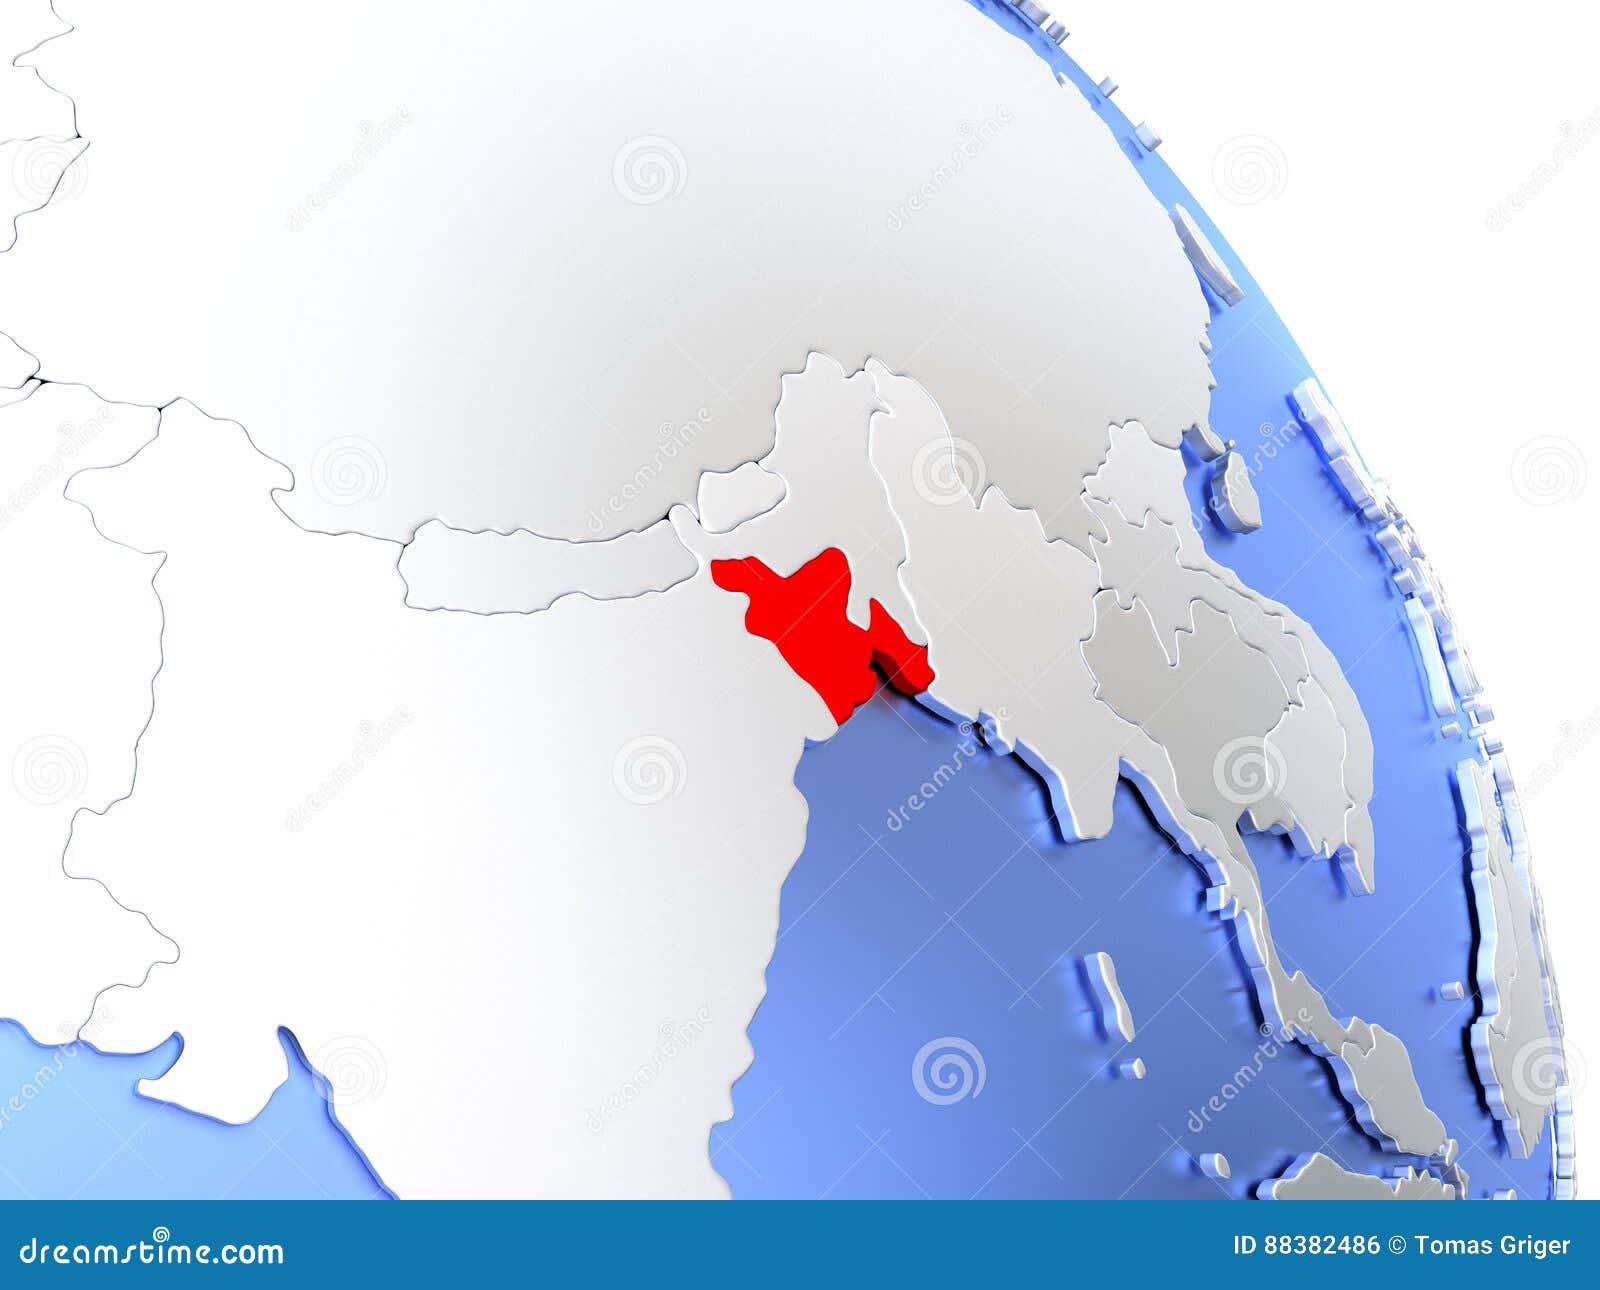 Bangladesh On Elegant Globe Stock Illustration - Illustration of ...